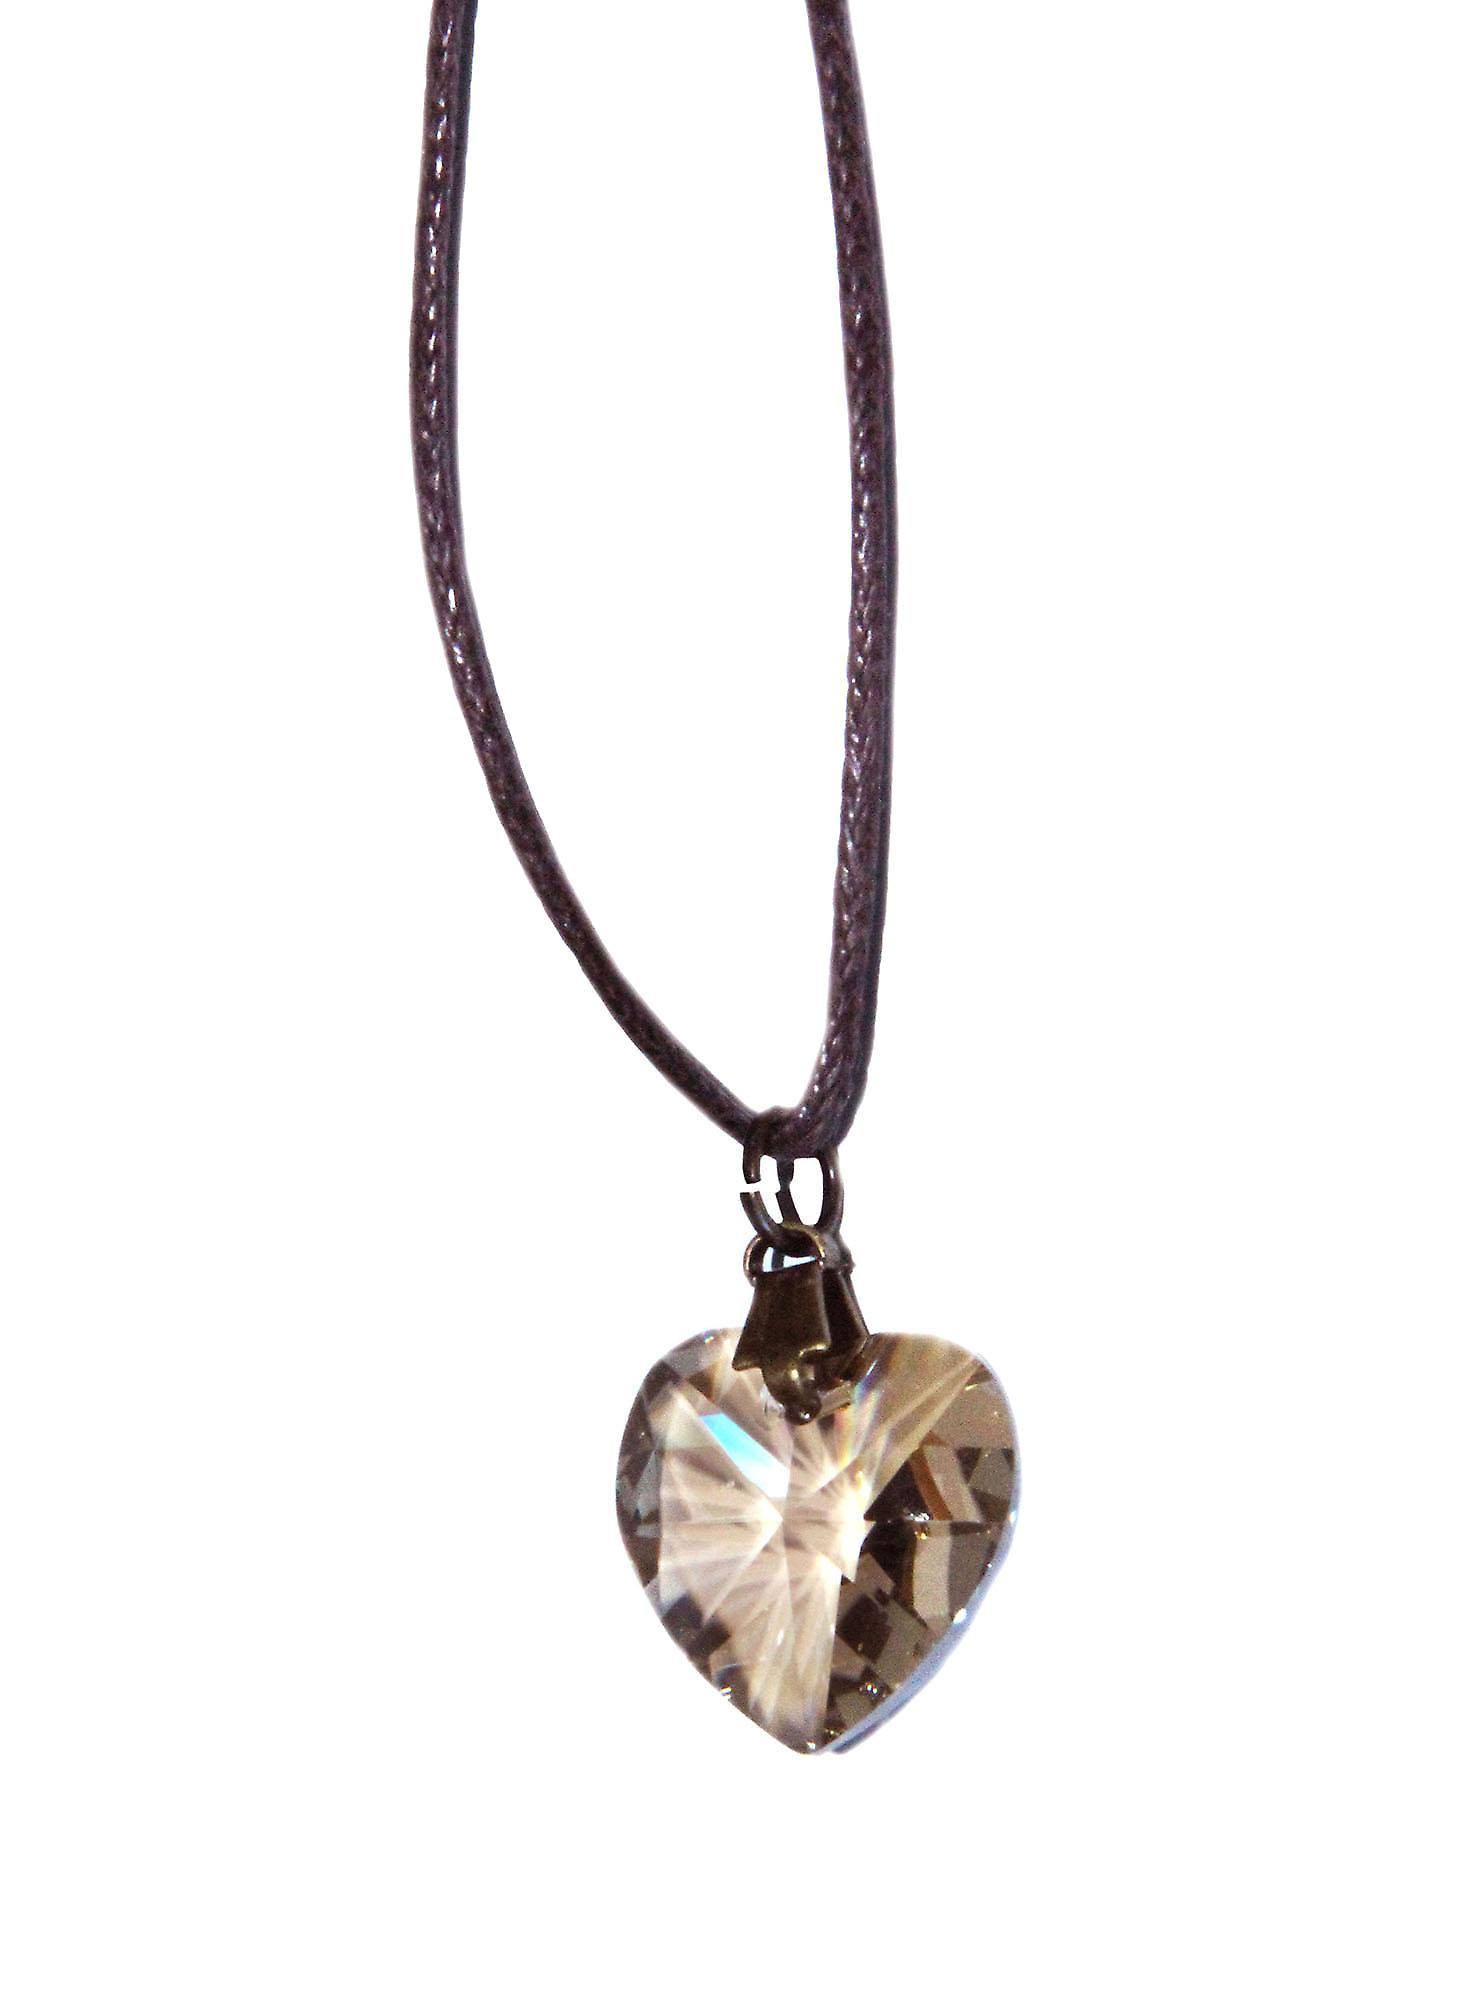 Waooh - Bijoux - Swarovski / Pendentif coeur beige avec cordon ciré